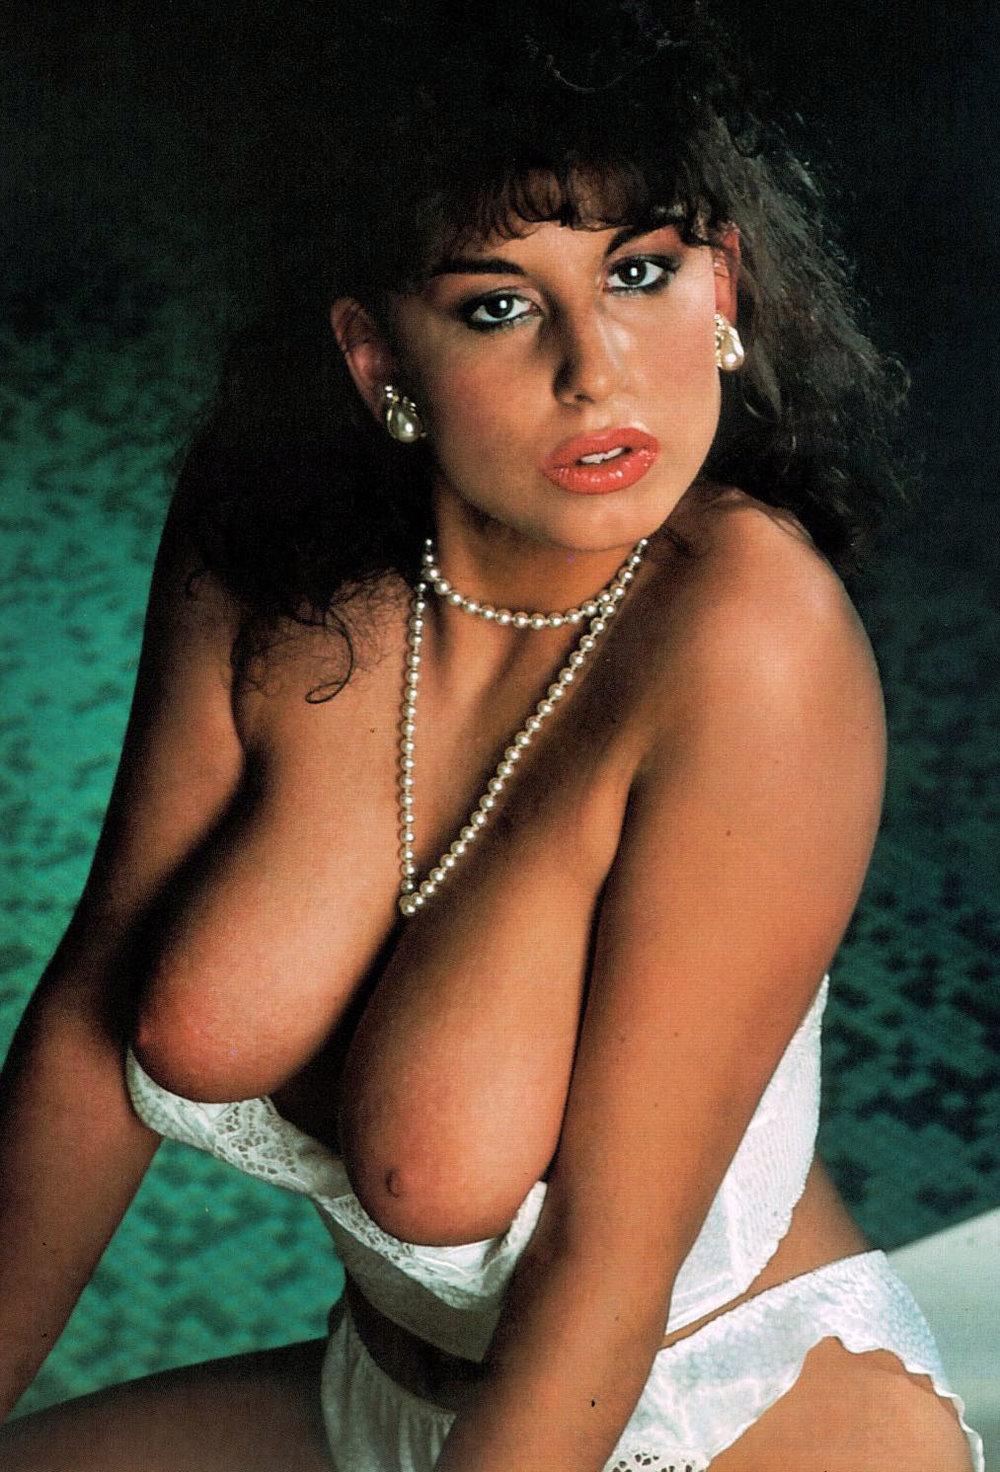 Sarah Young (pornographic actress) nude (88 images) Ass, Snapchat, lingerie